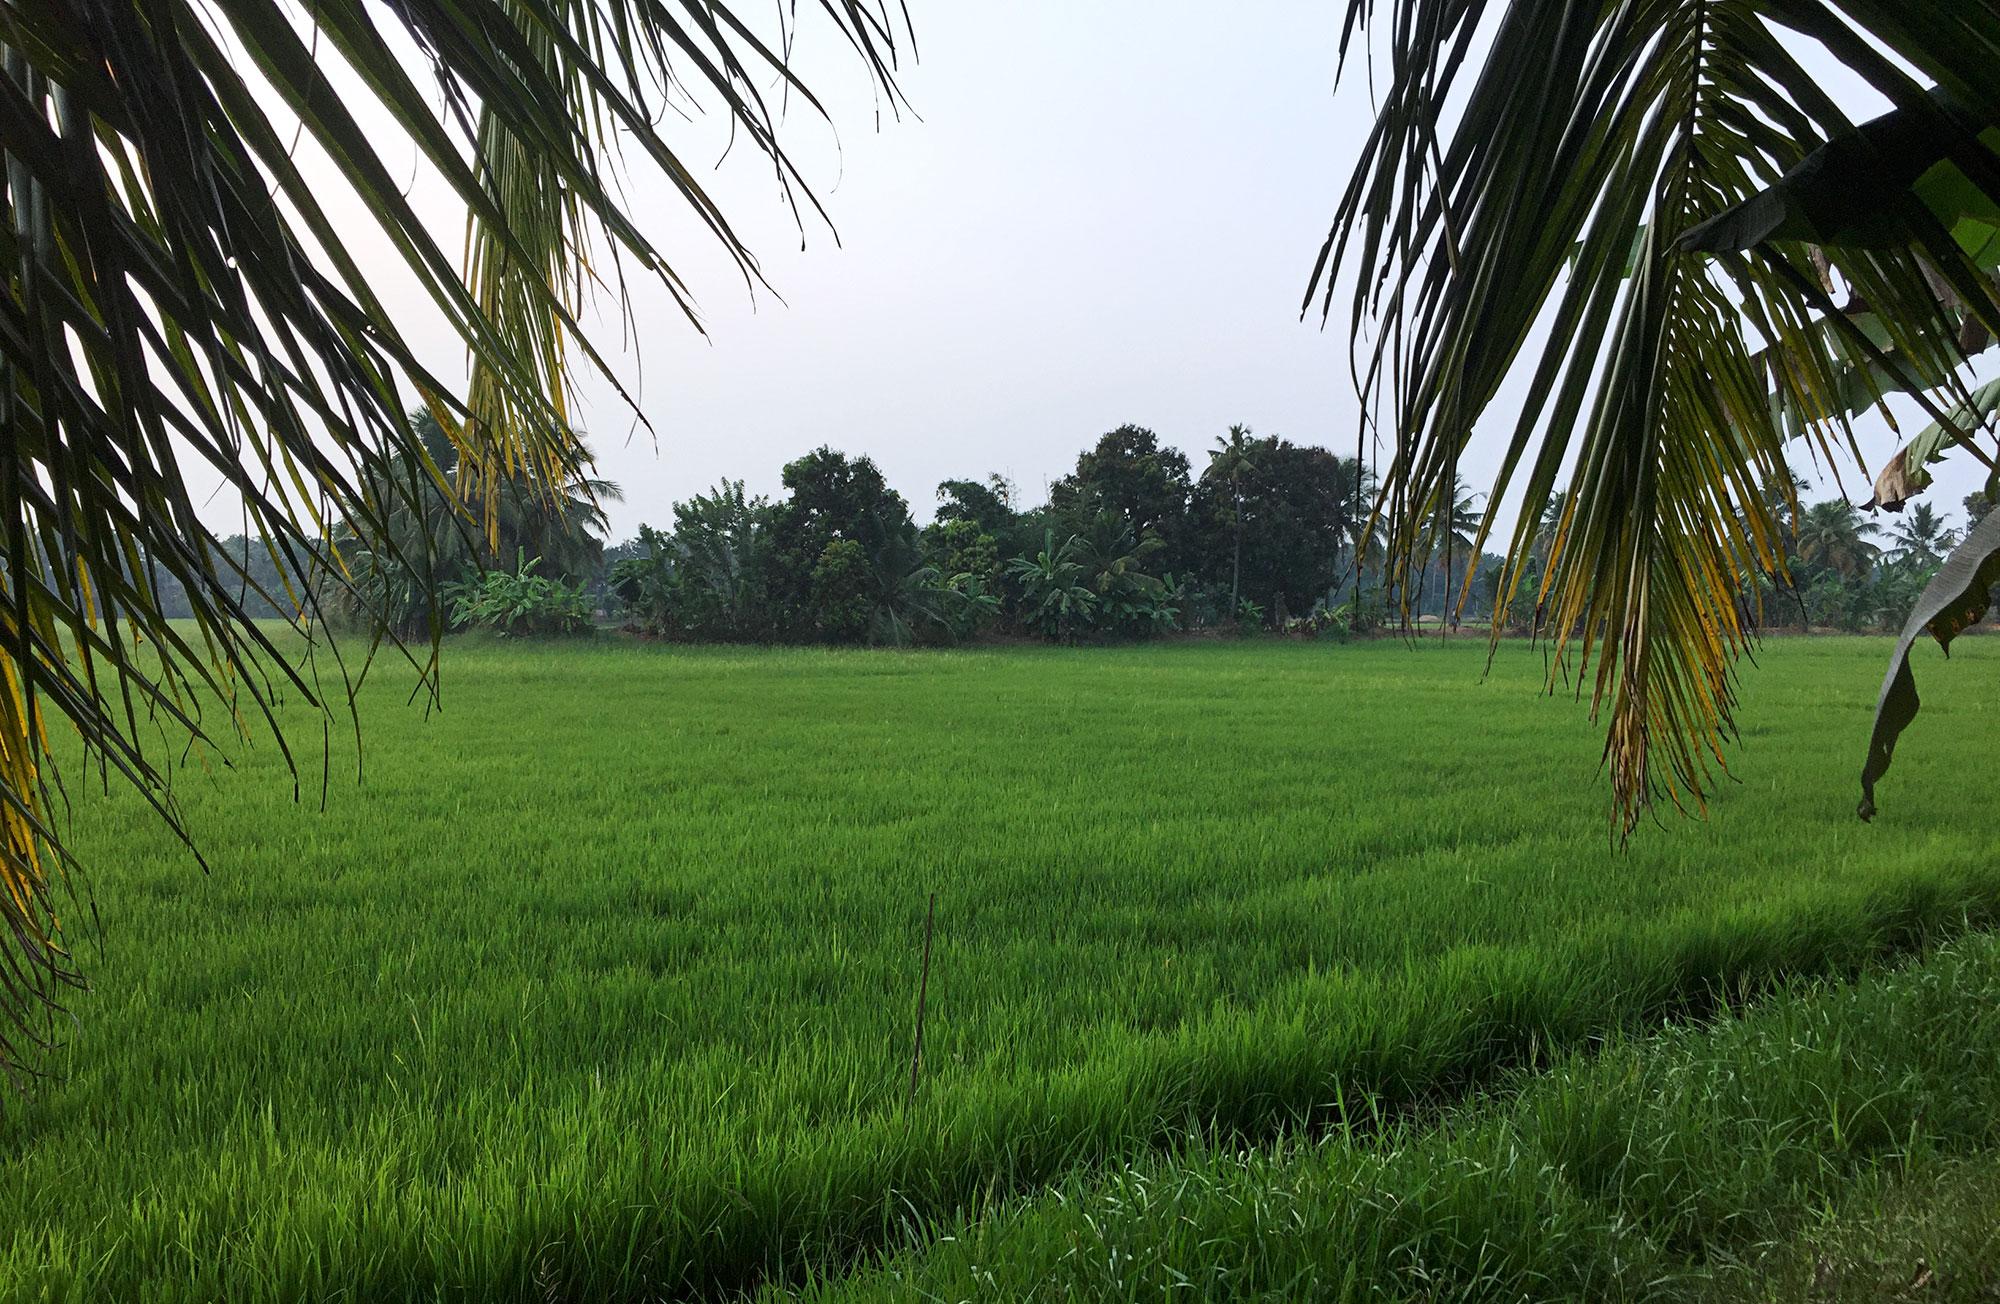 Rice paddy in the Kerala backwater.